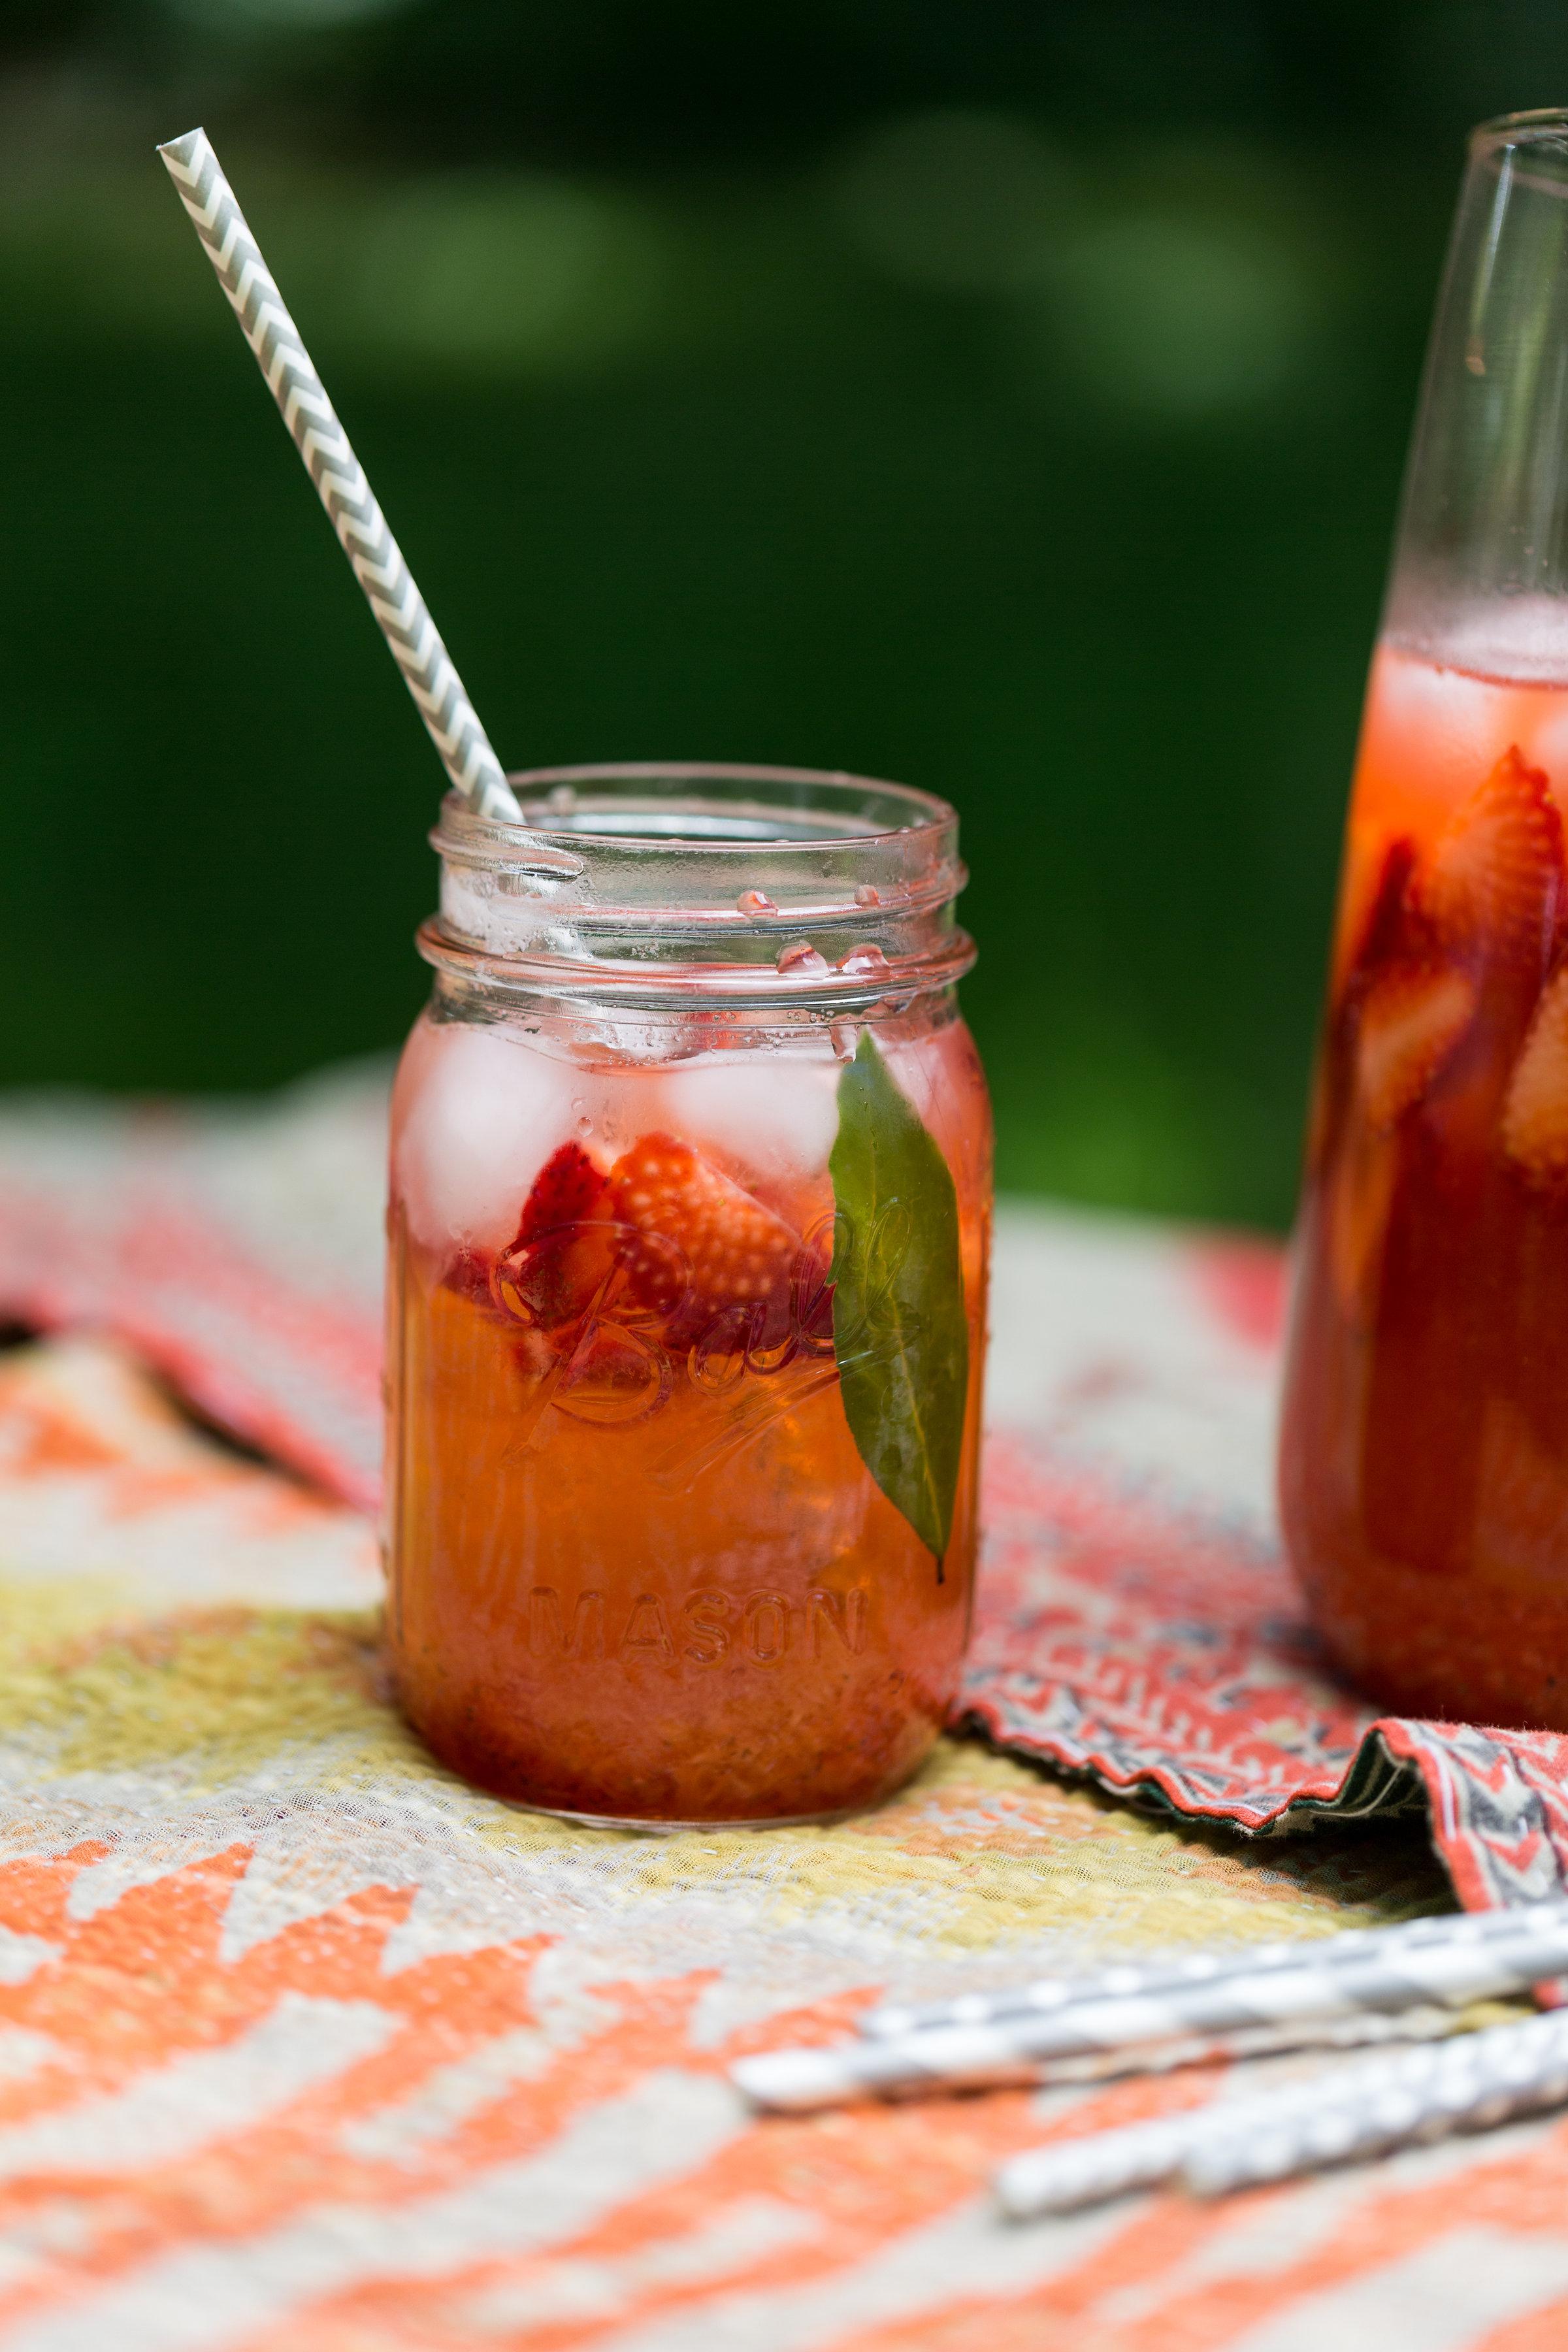 Recipe for Strawberry Rhubarb Black Pepper Lemonade from CTEatsOut.com